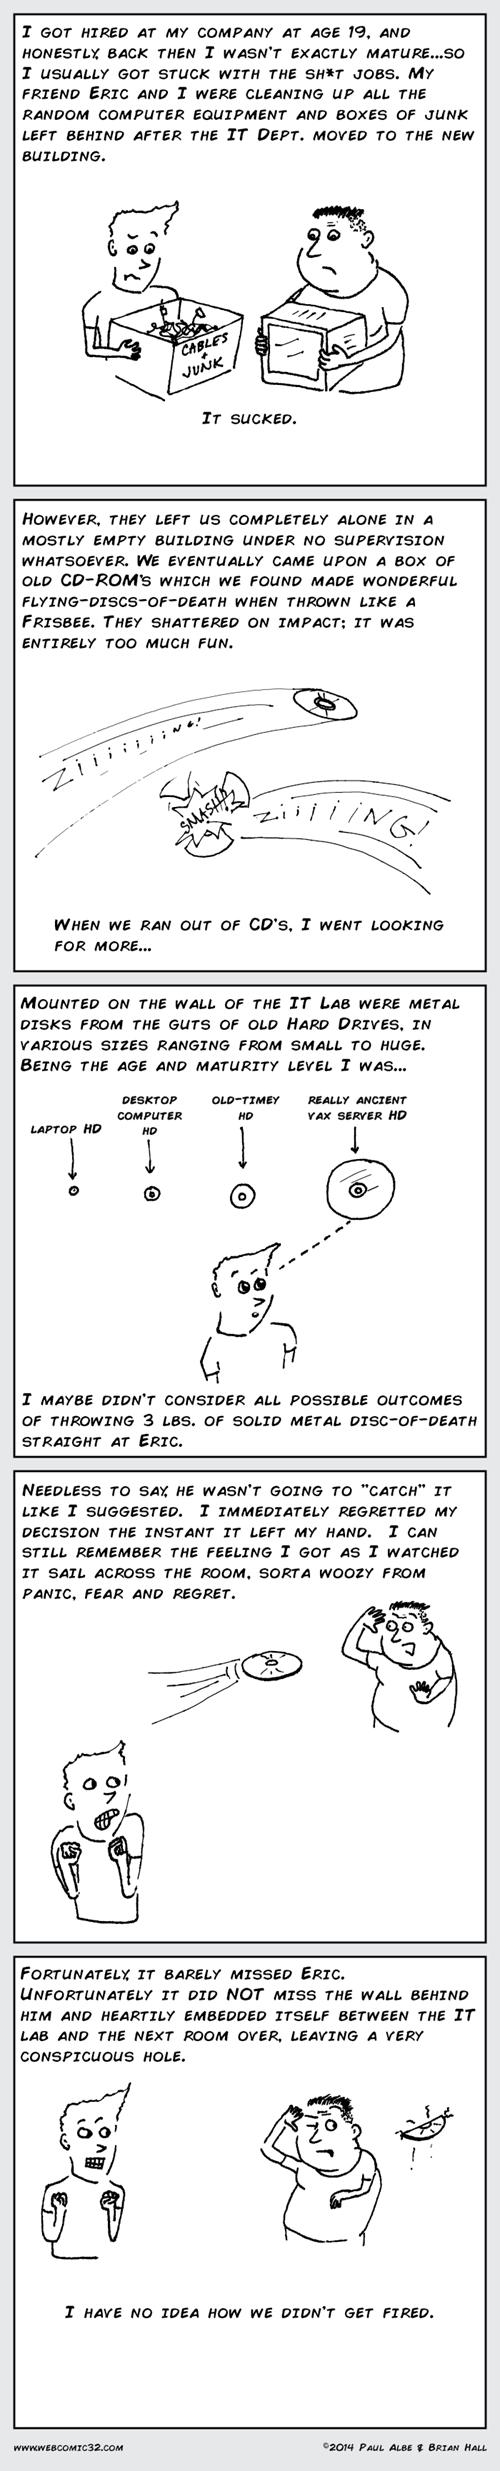 goofing off jobs yikes web comics - 8184976384